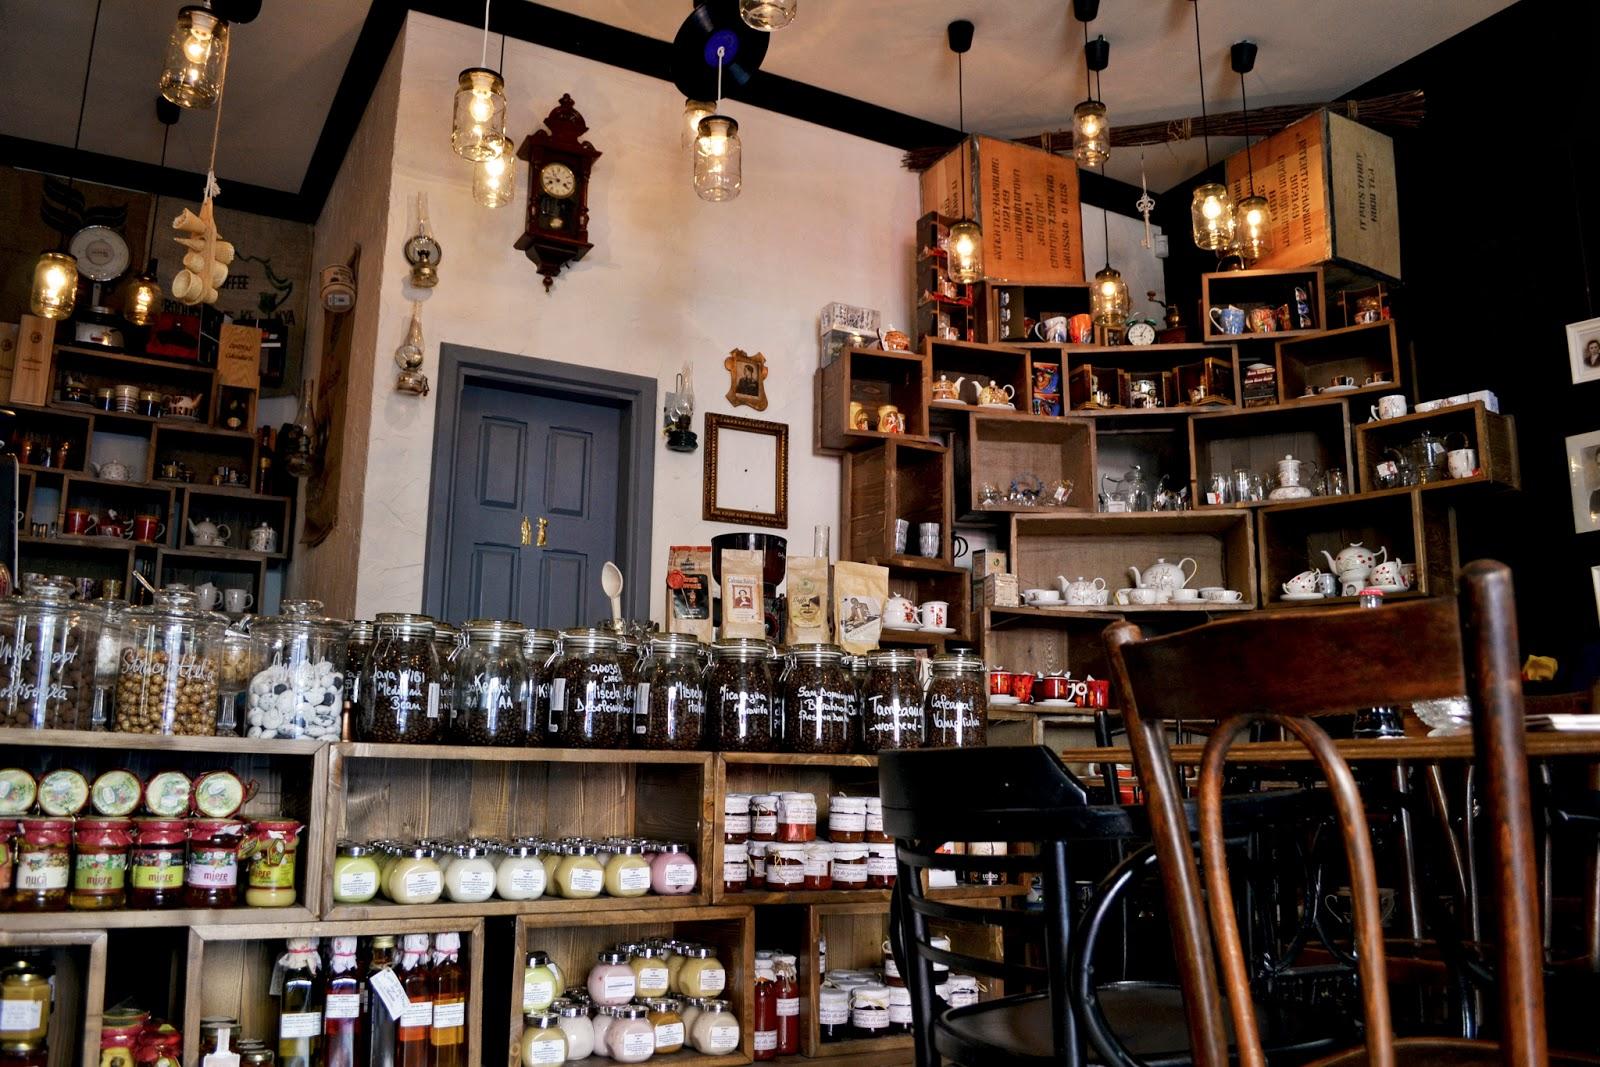 camera din fata, unde sa-mi beau cafeaua, blog, wheretohavecoffee